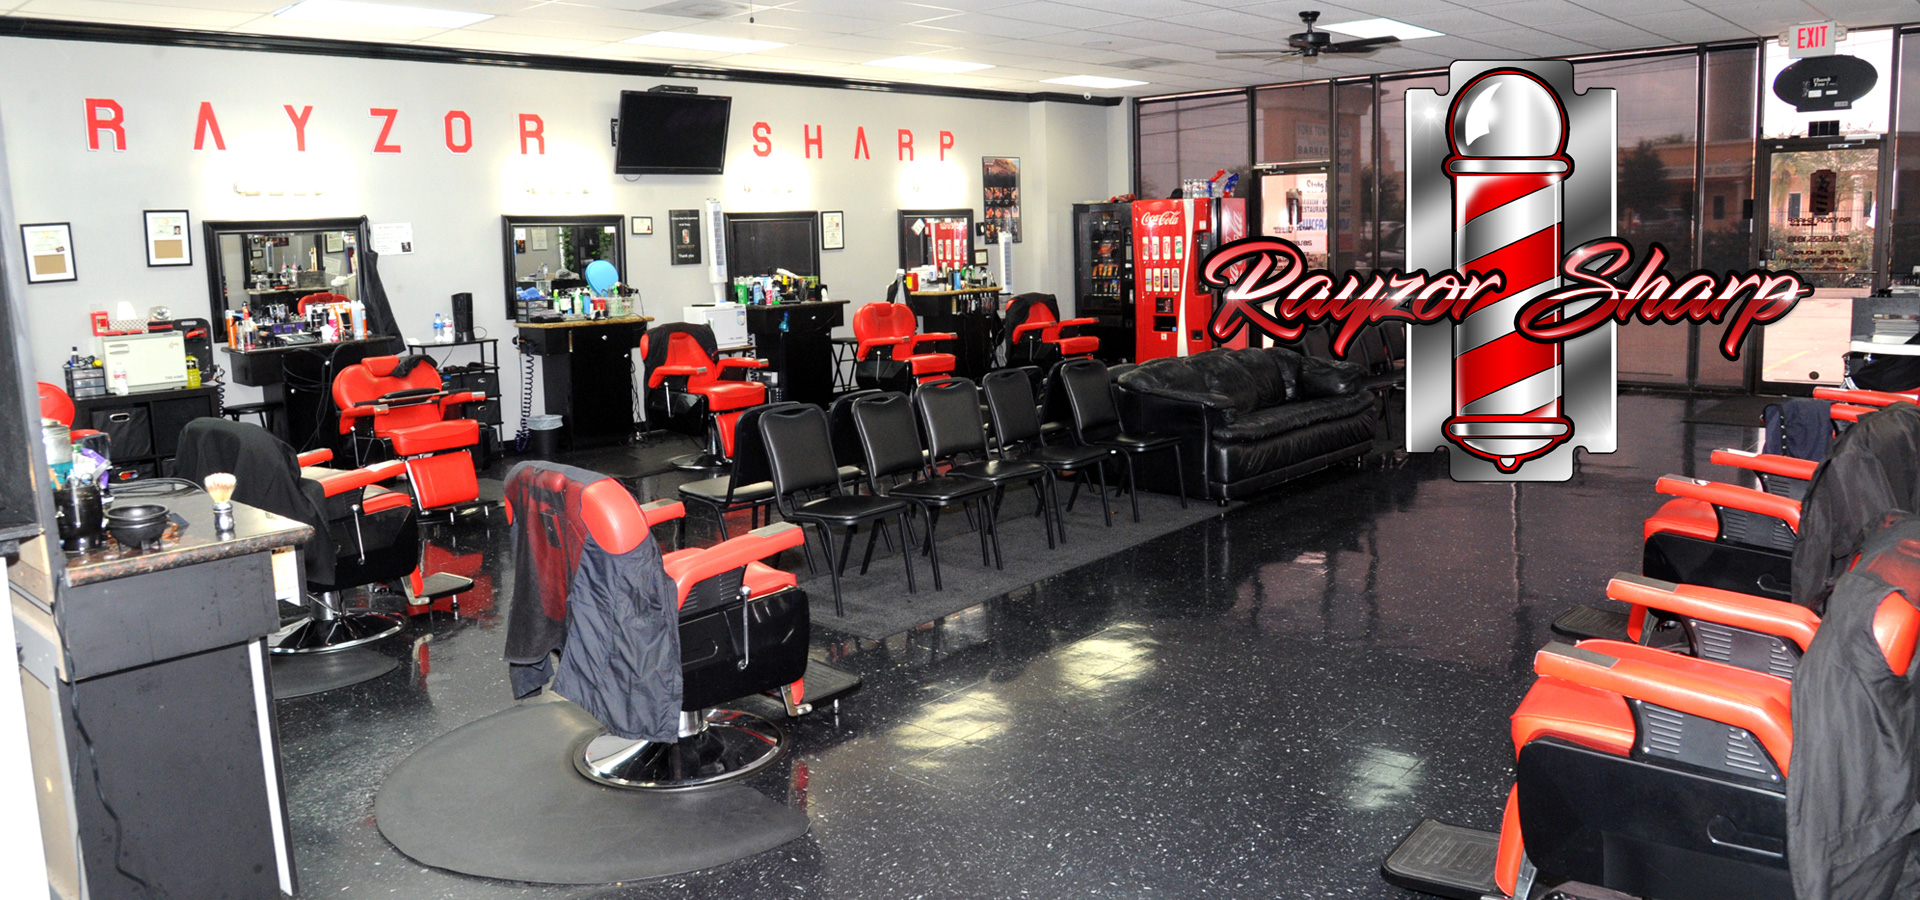 Barber Shop In Houston Texas Rayzor Sharp Barber Shop